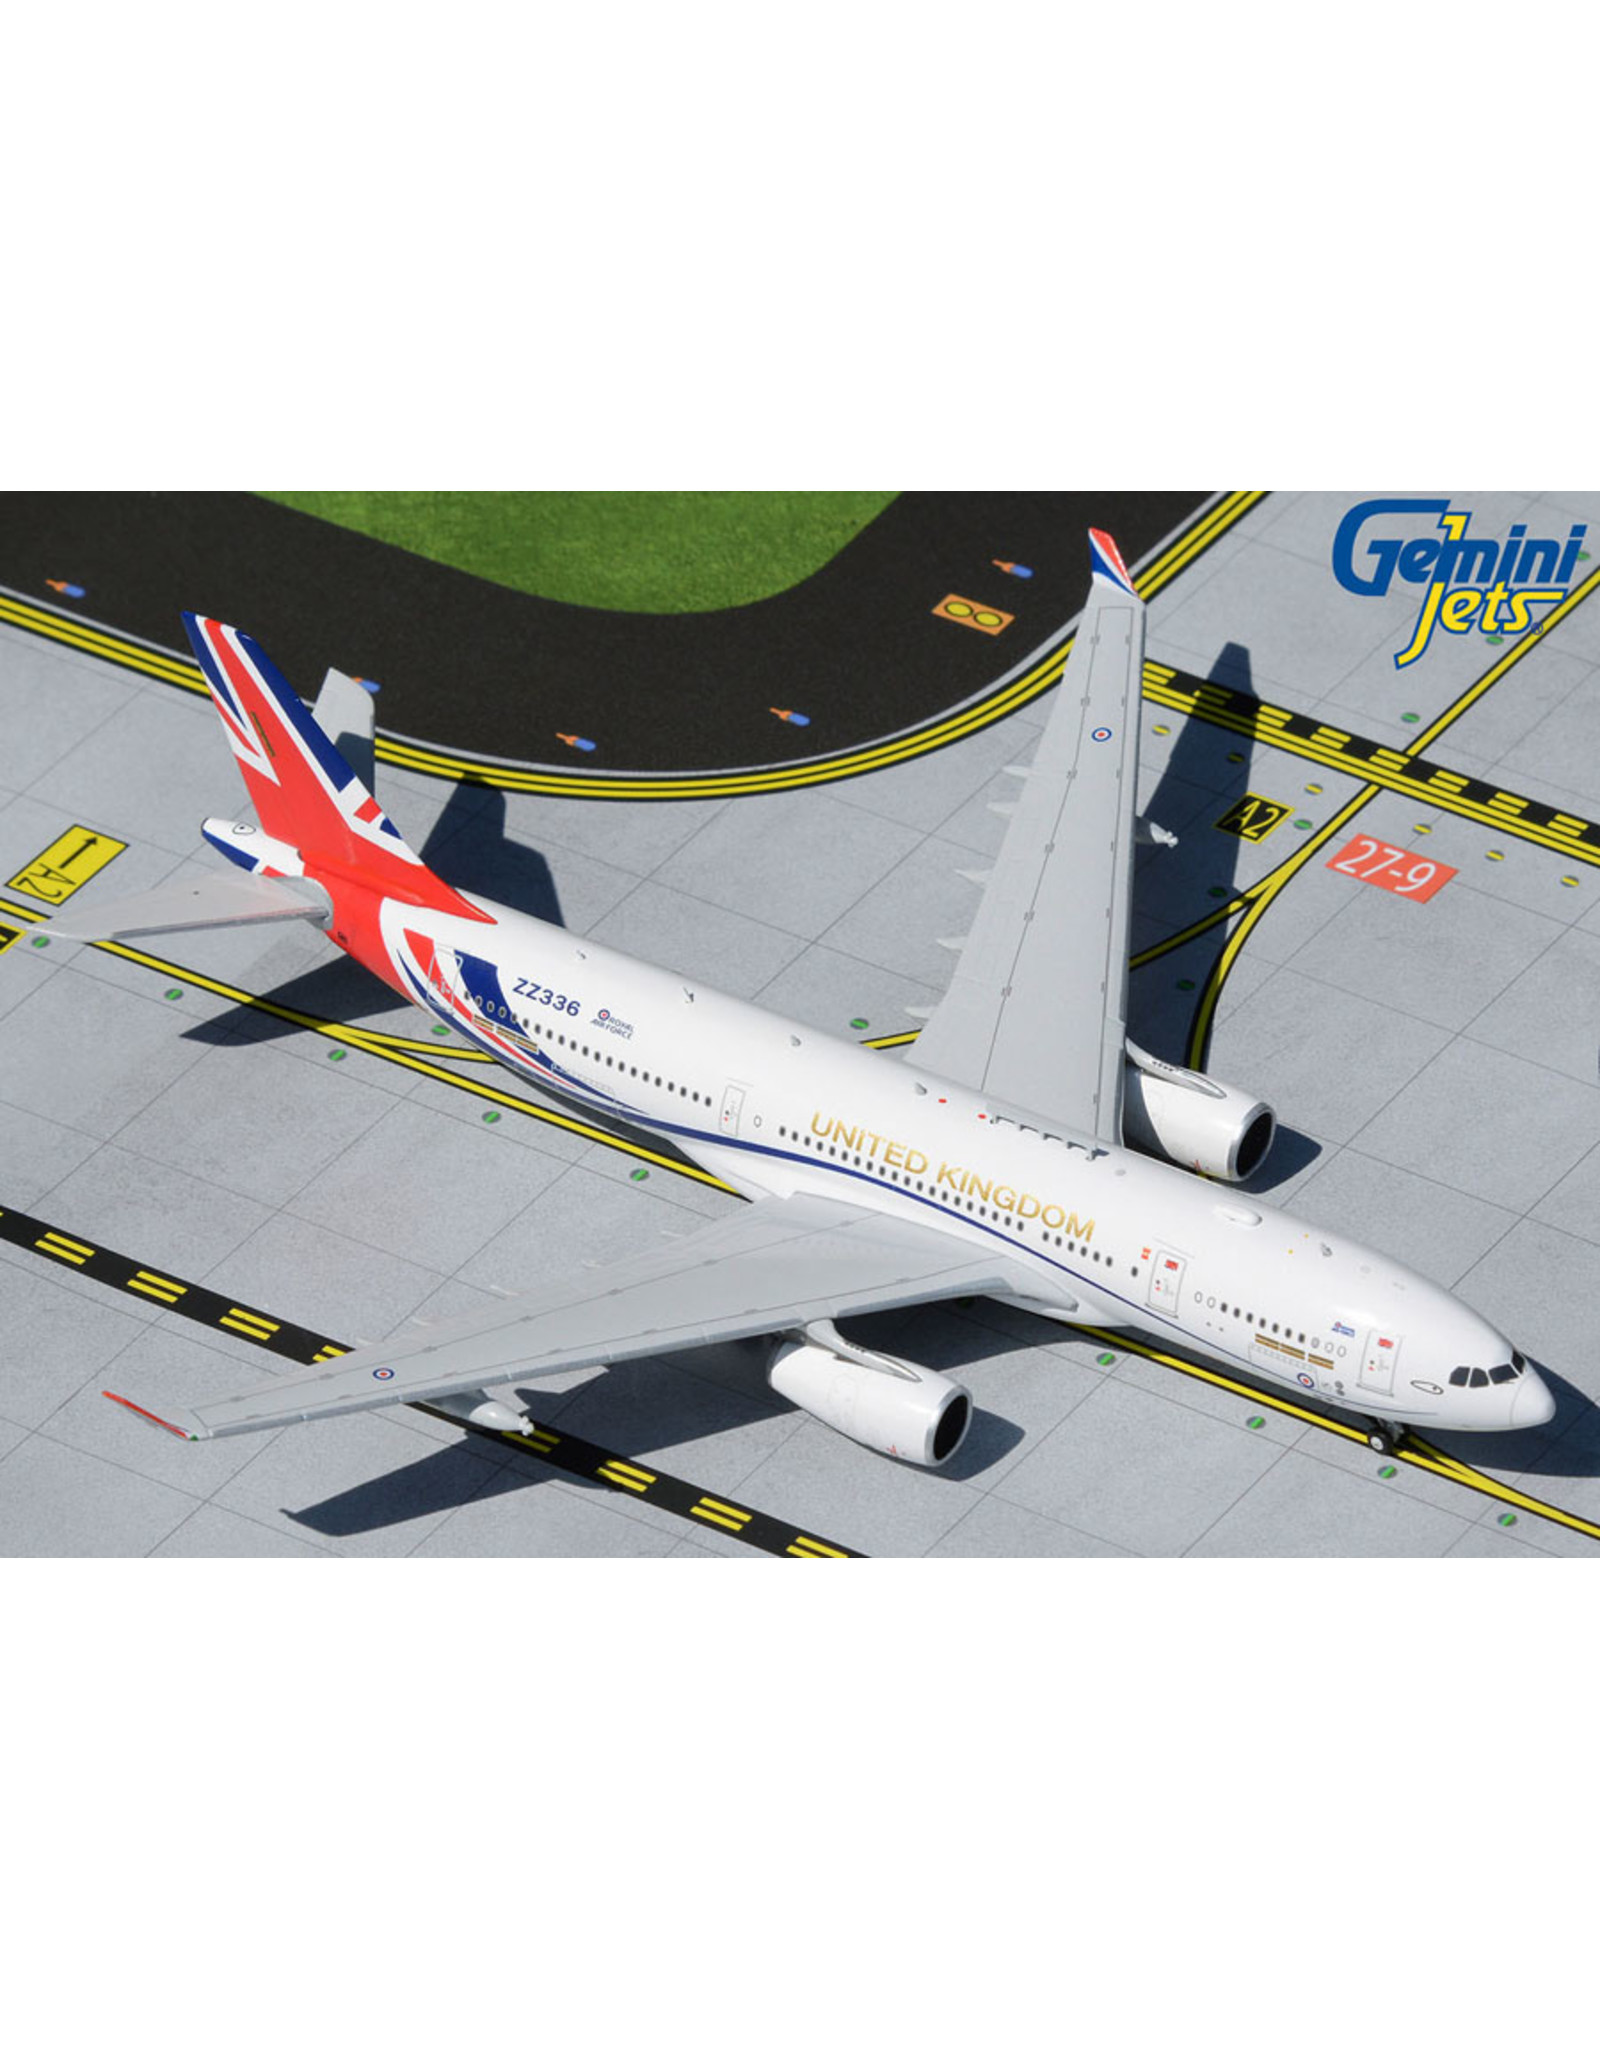 Gem4 RAF A330-200 MRTT Voyager UK